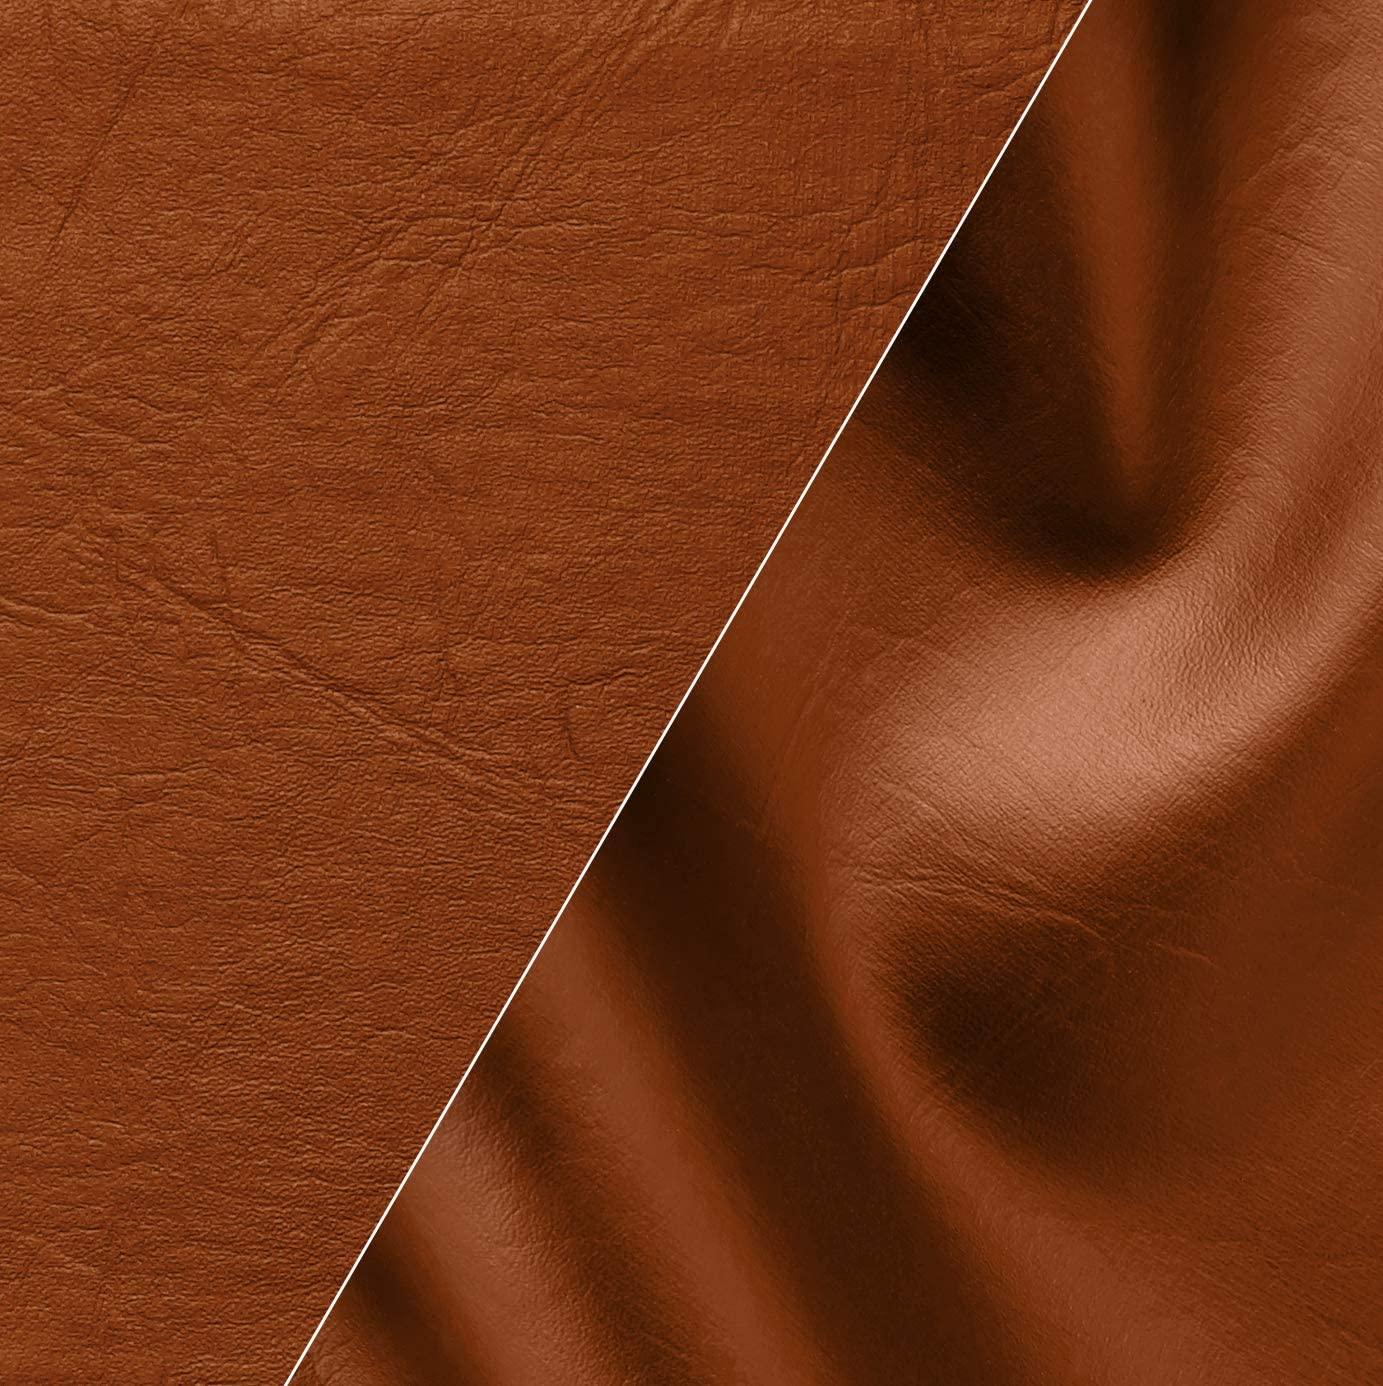 VViViD Light Brown Weatherproof Faux Leather Finish Marine Vinyl Fabric (10ft x 54